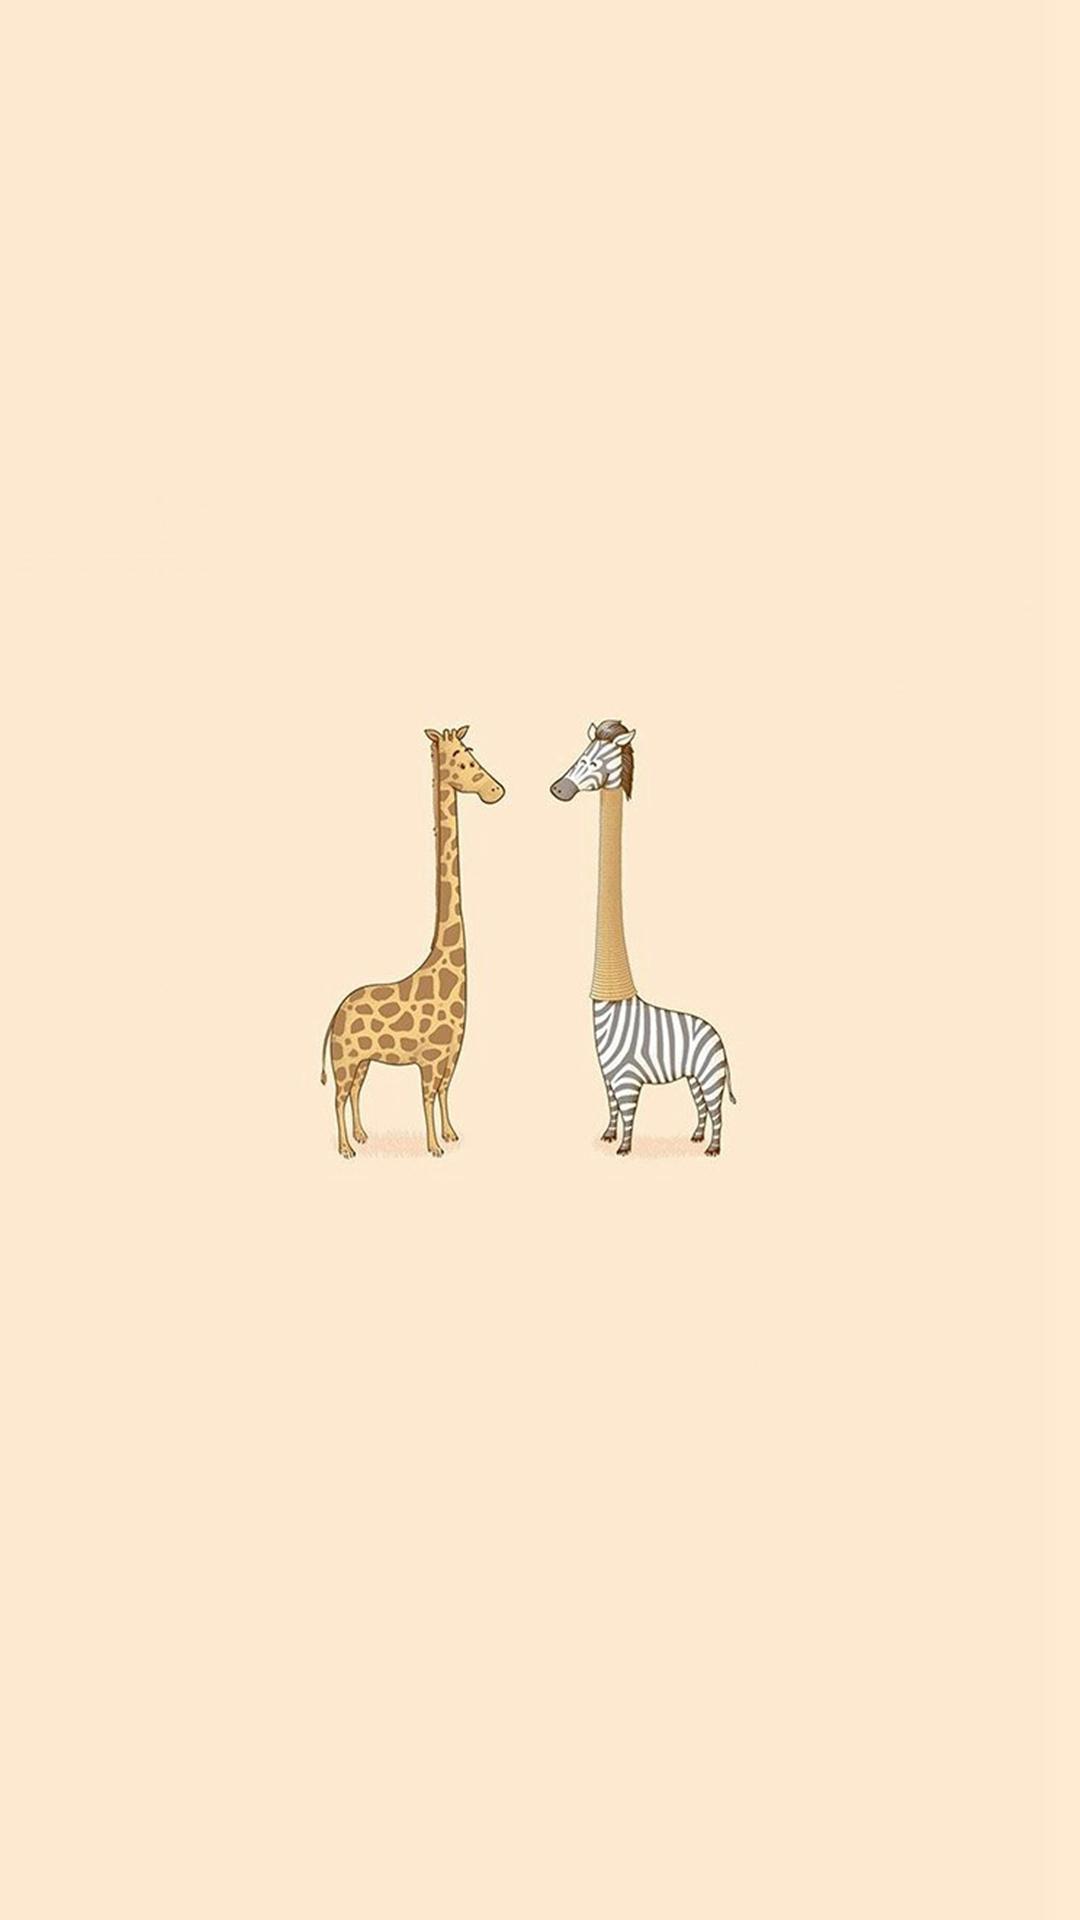 Cute-Giraffe-Yellow-Animal-Minimal-iPhone-wallpaper-wp5006424